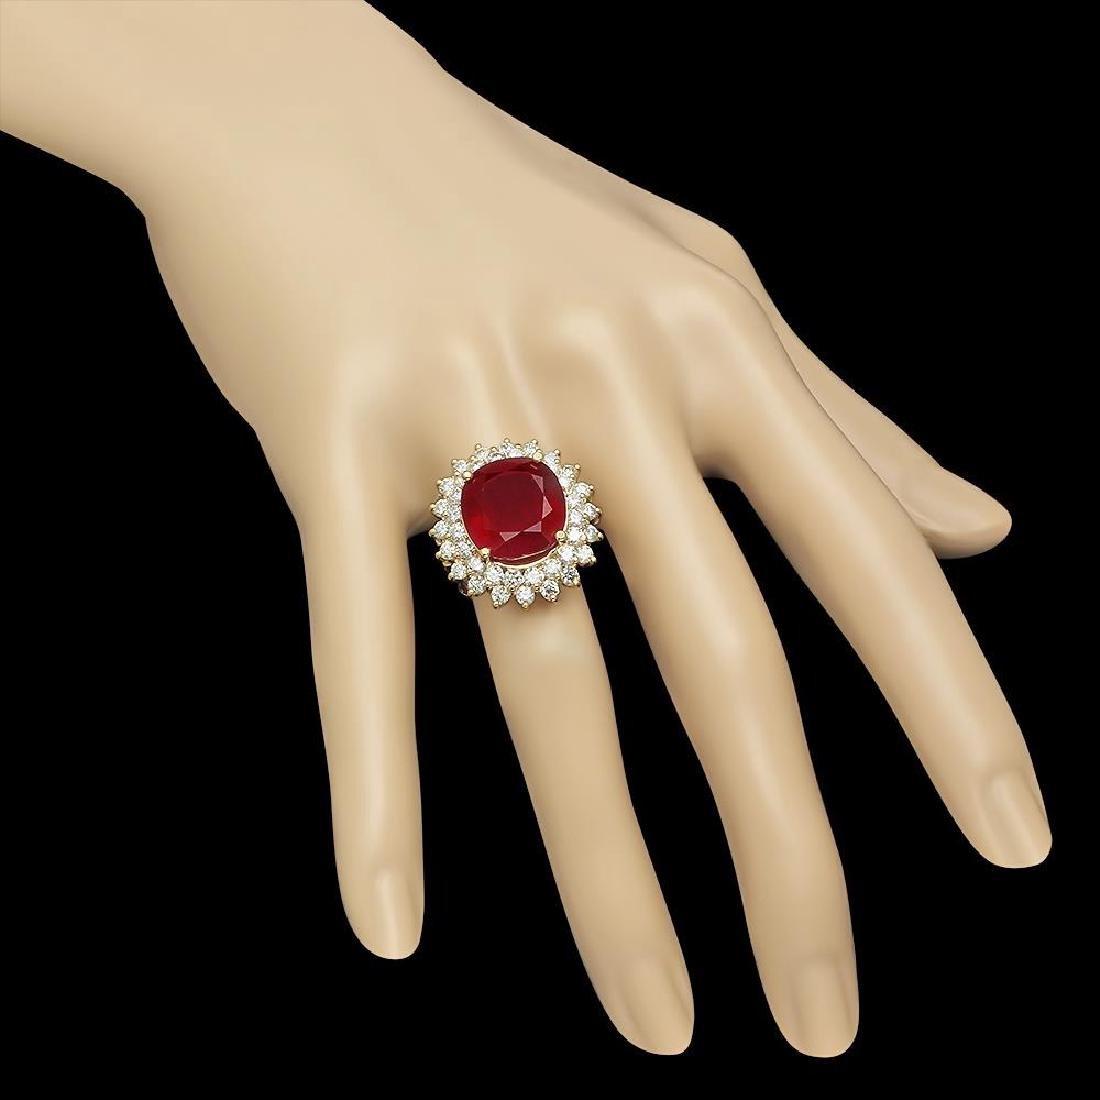 14K Gold 14.38ct Ruby 2.38ct Diamond Ring - 3